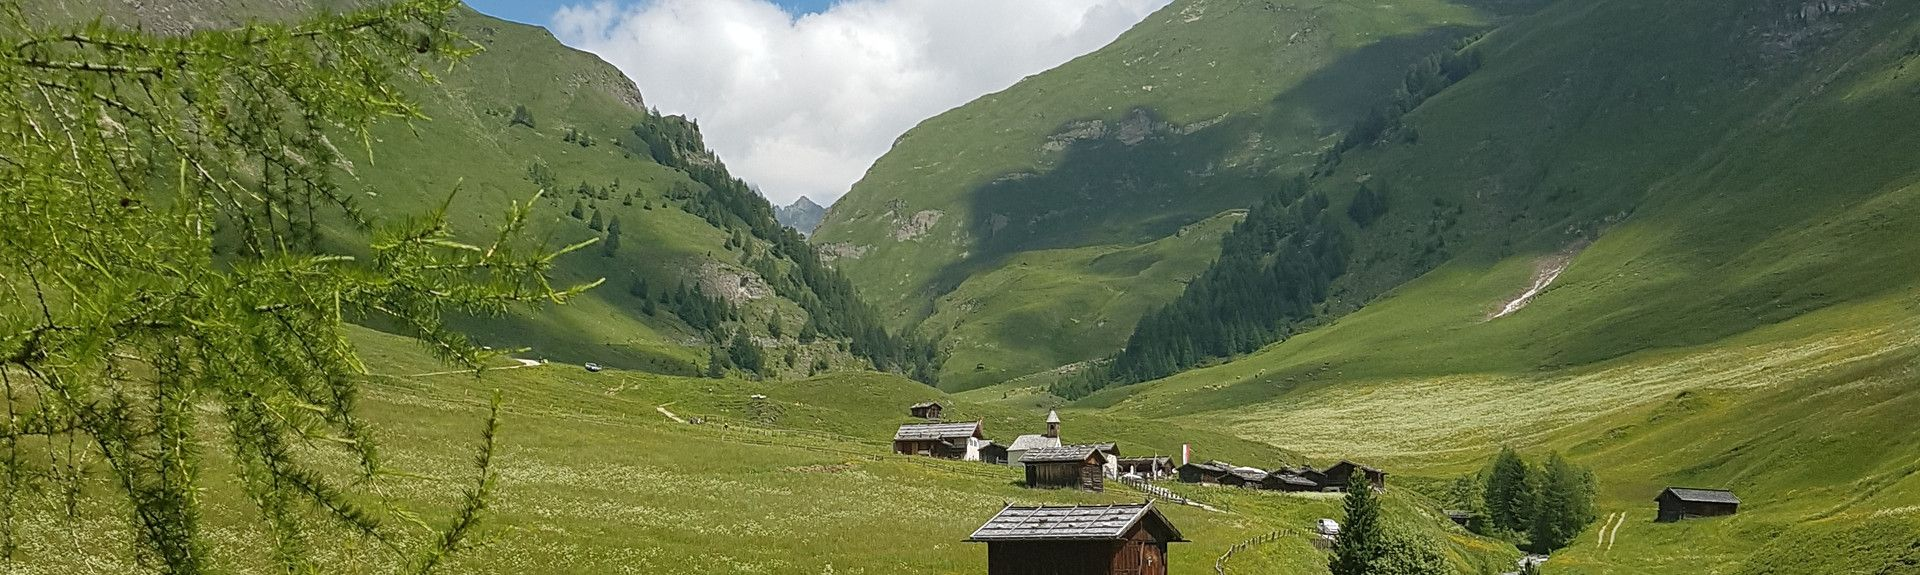 Sarntal, Alto Adige, Trentino-Alto Adige, Italy